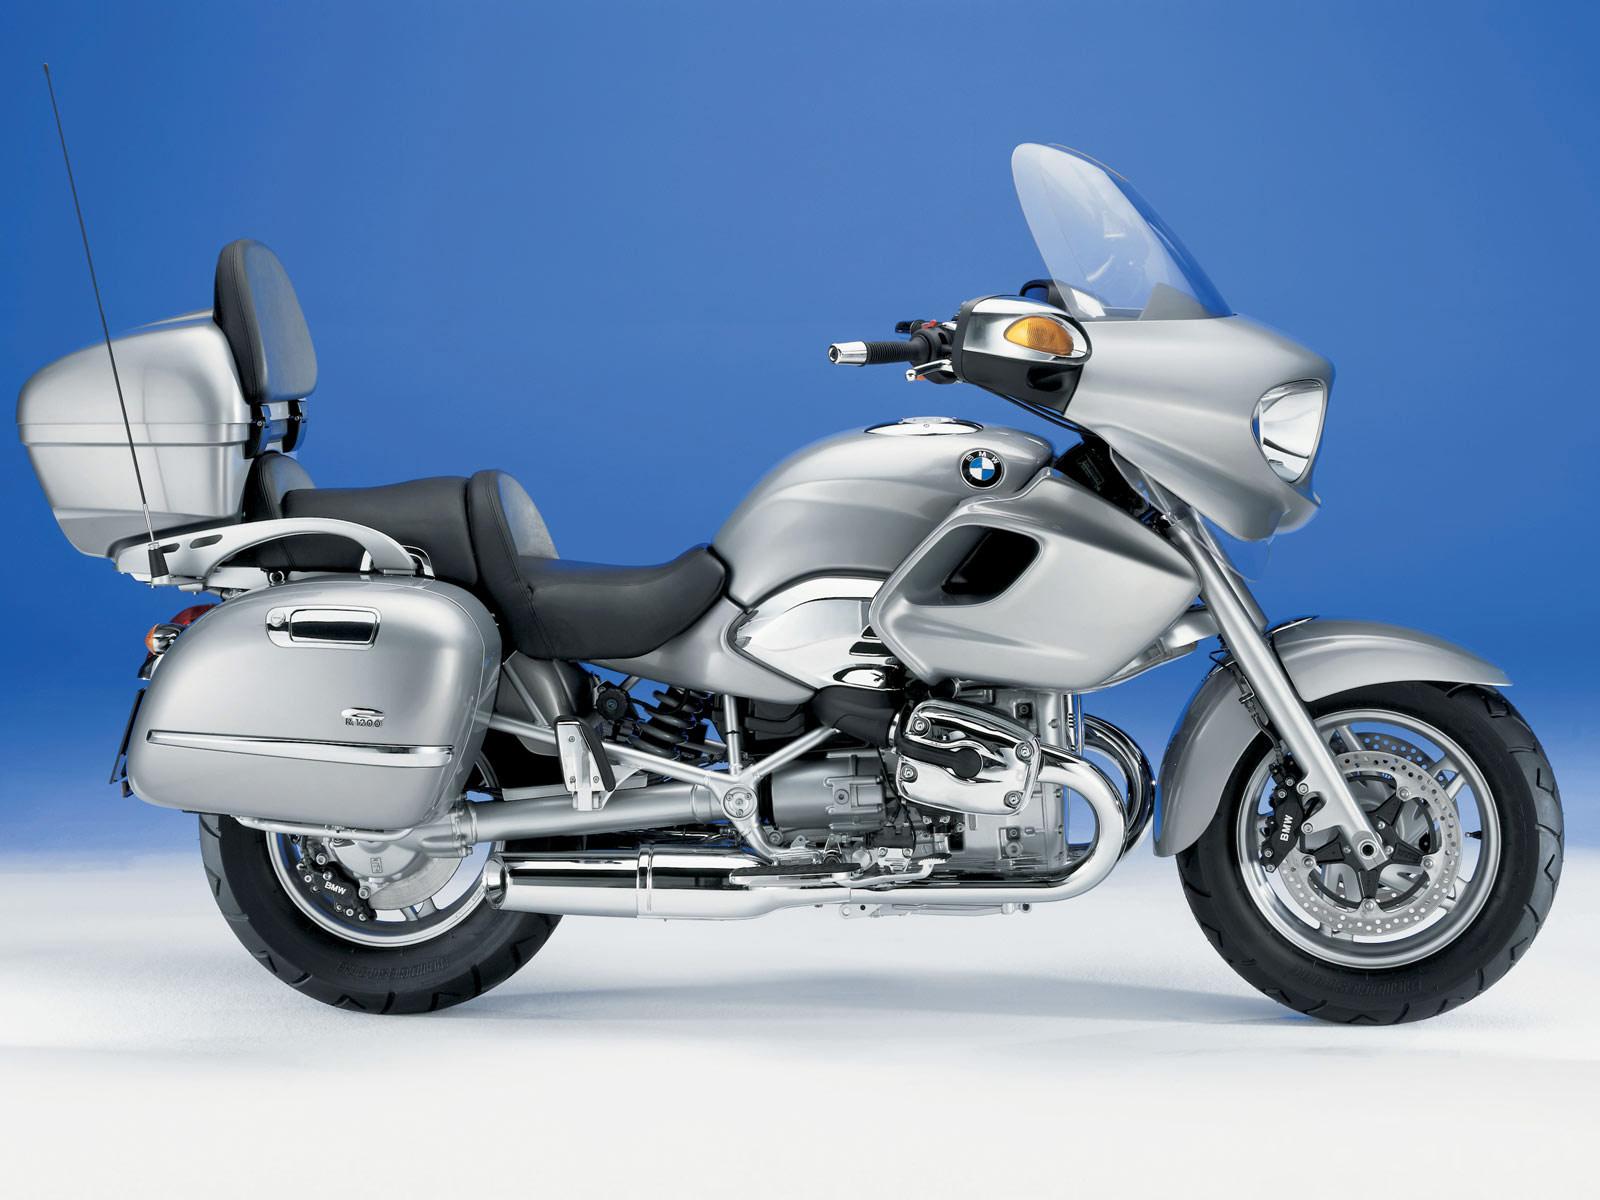 Bmw Desktop Wallpapers Motorcycle